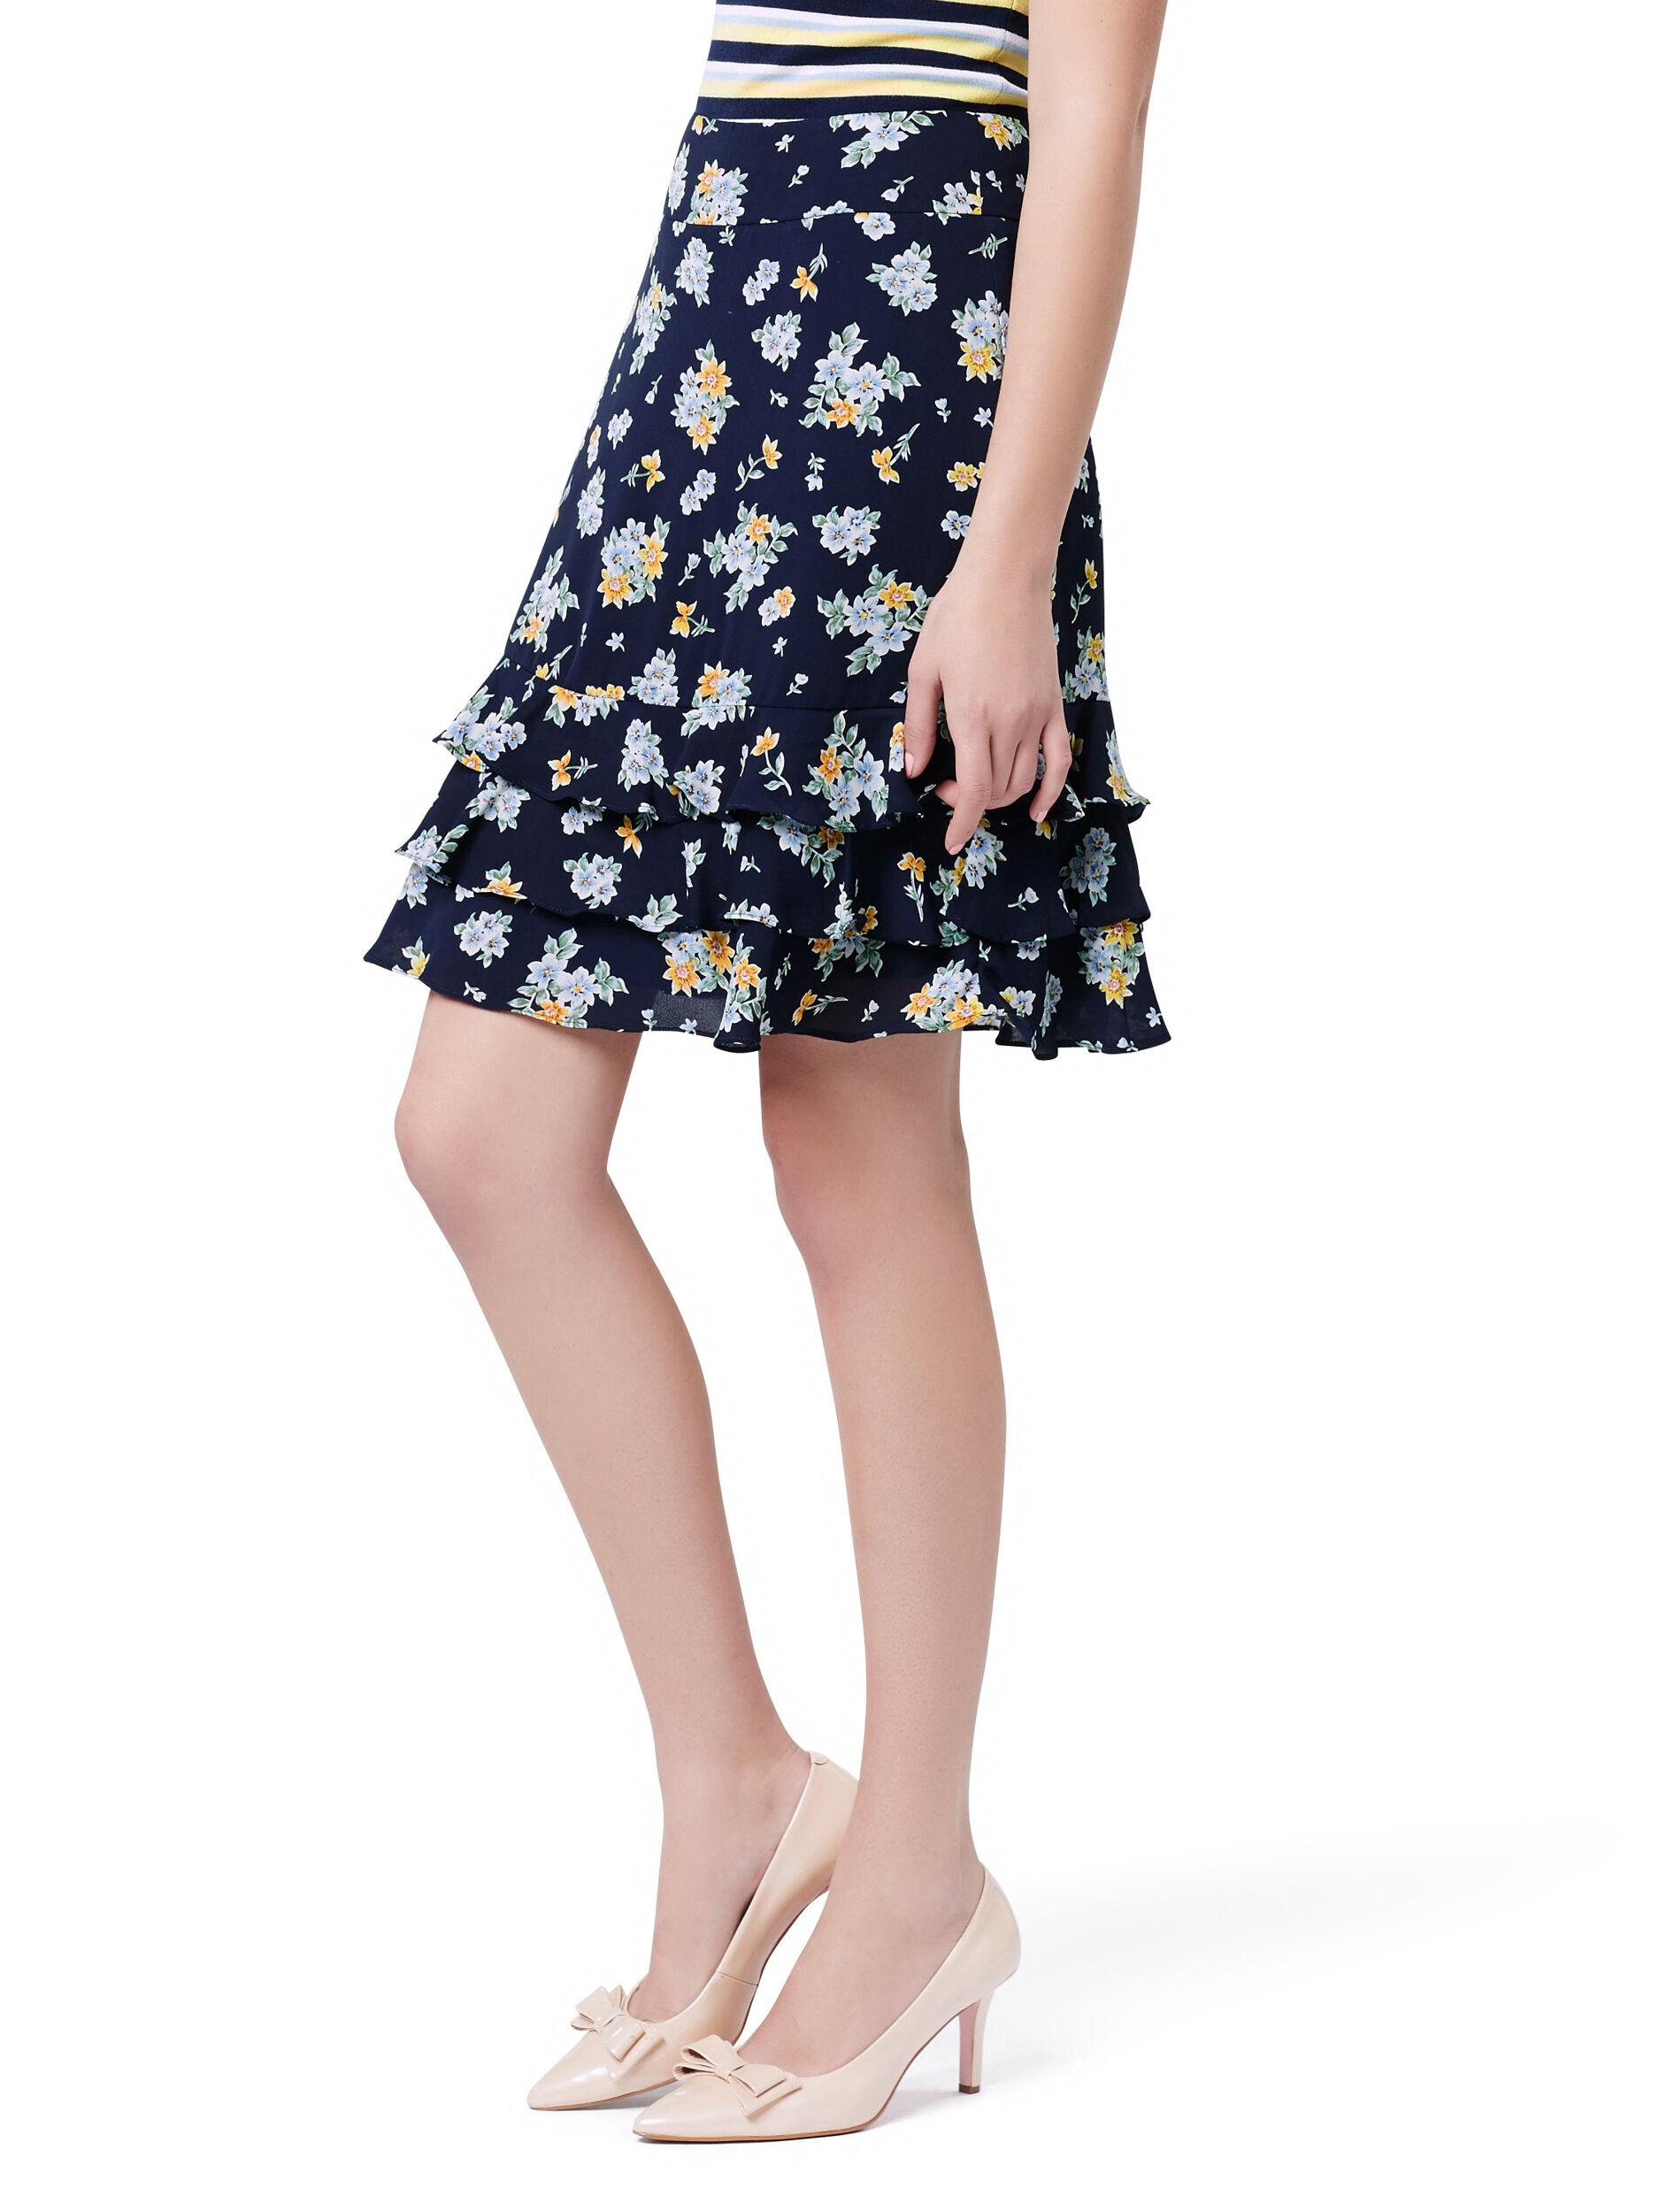 Caitlyn Skirt